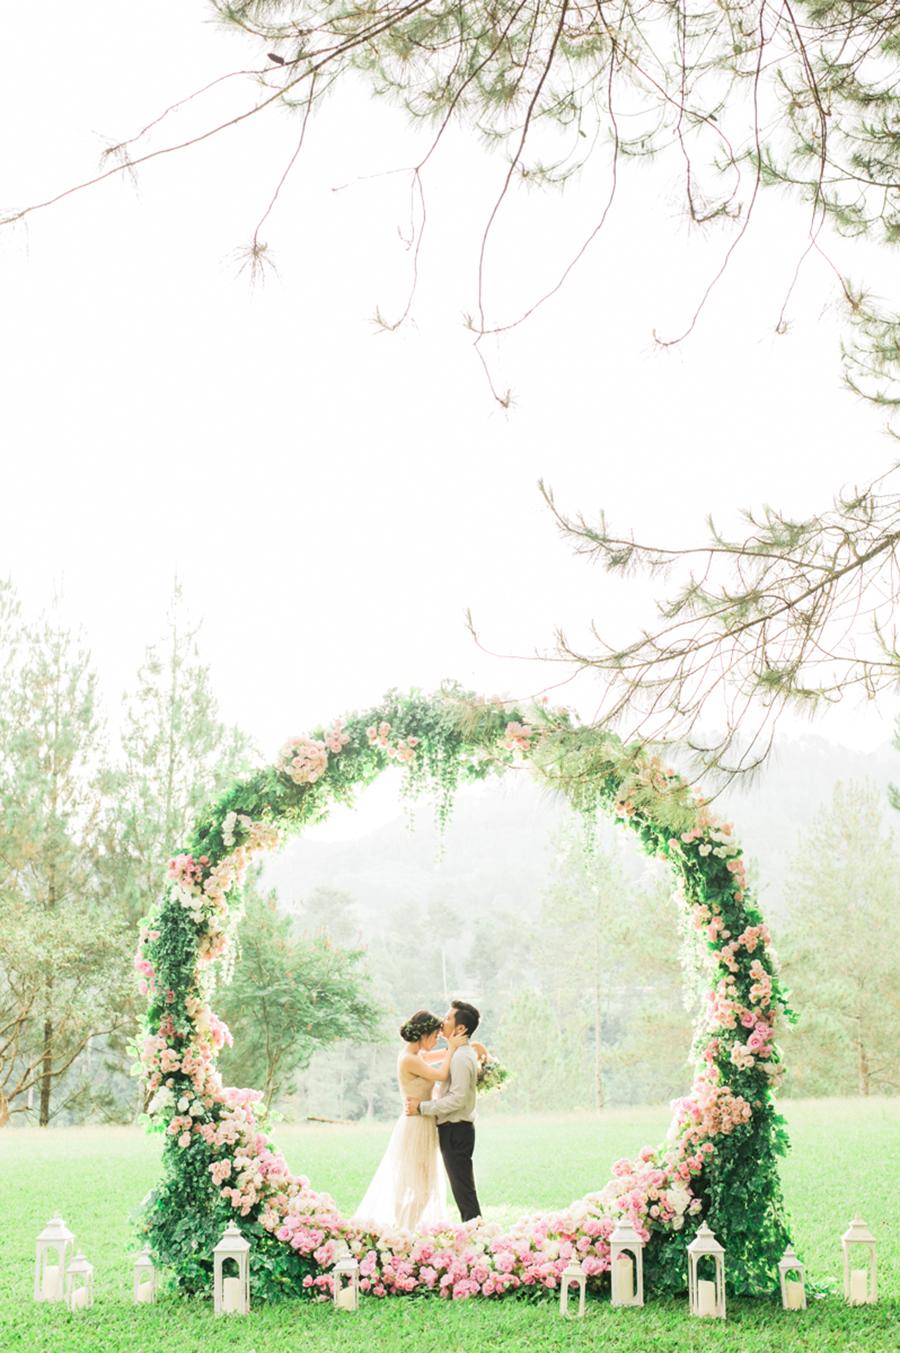 VIA  The Wedding Scoop